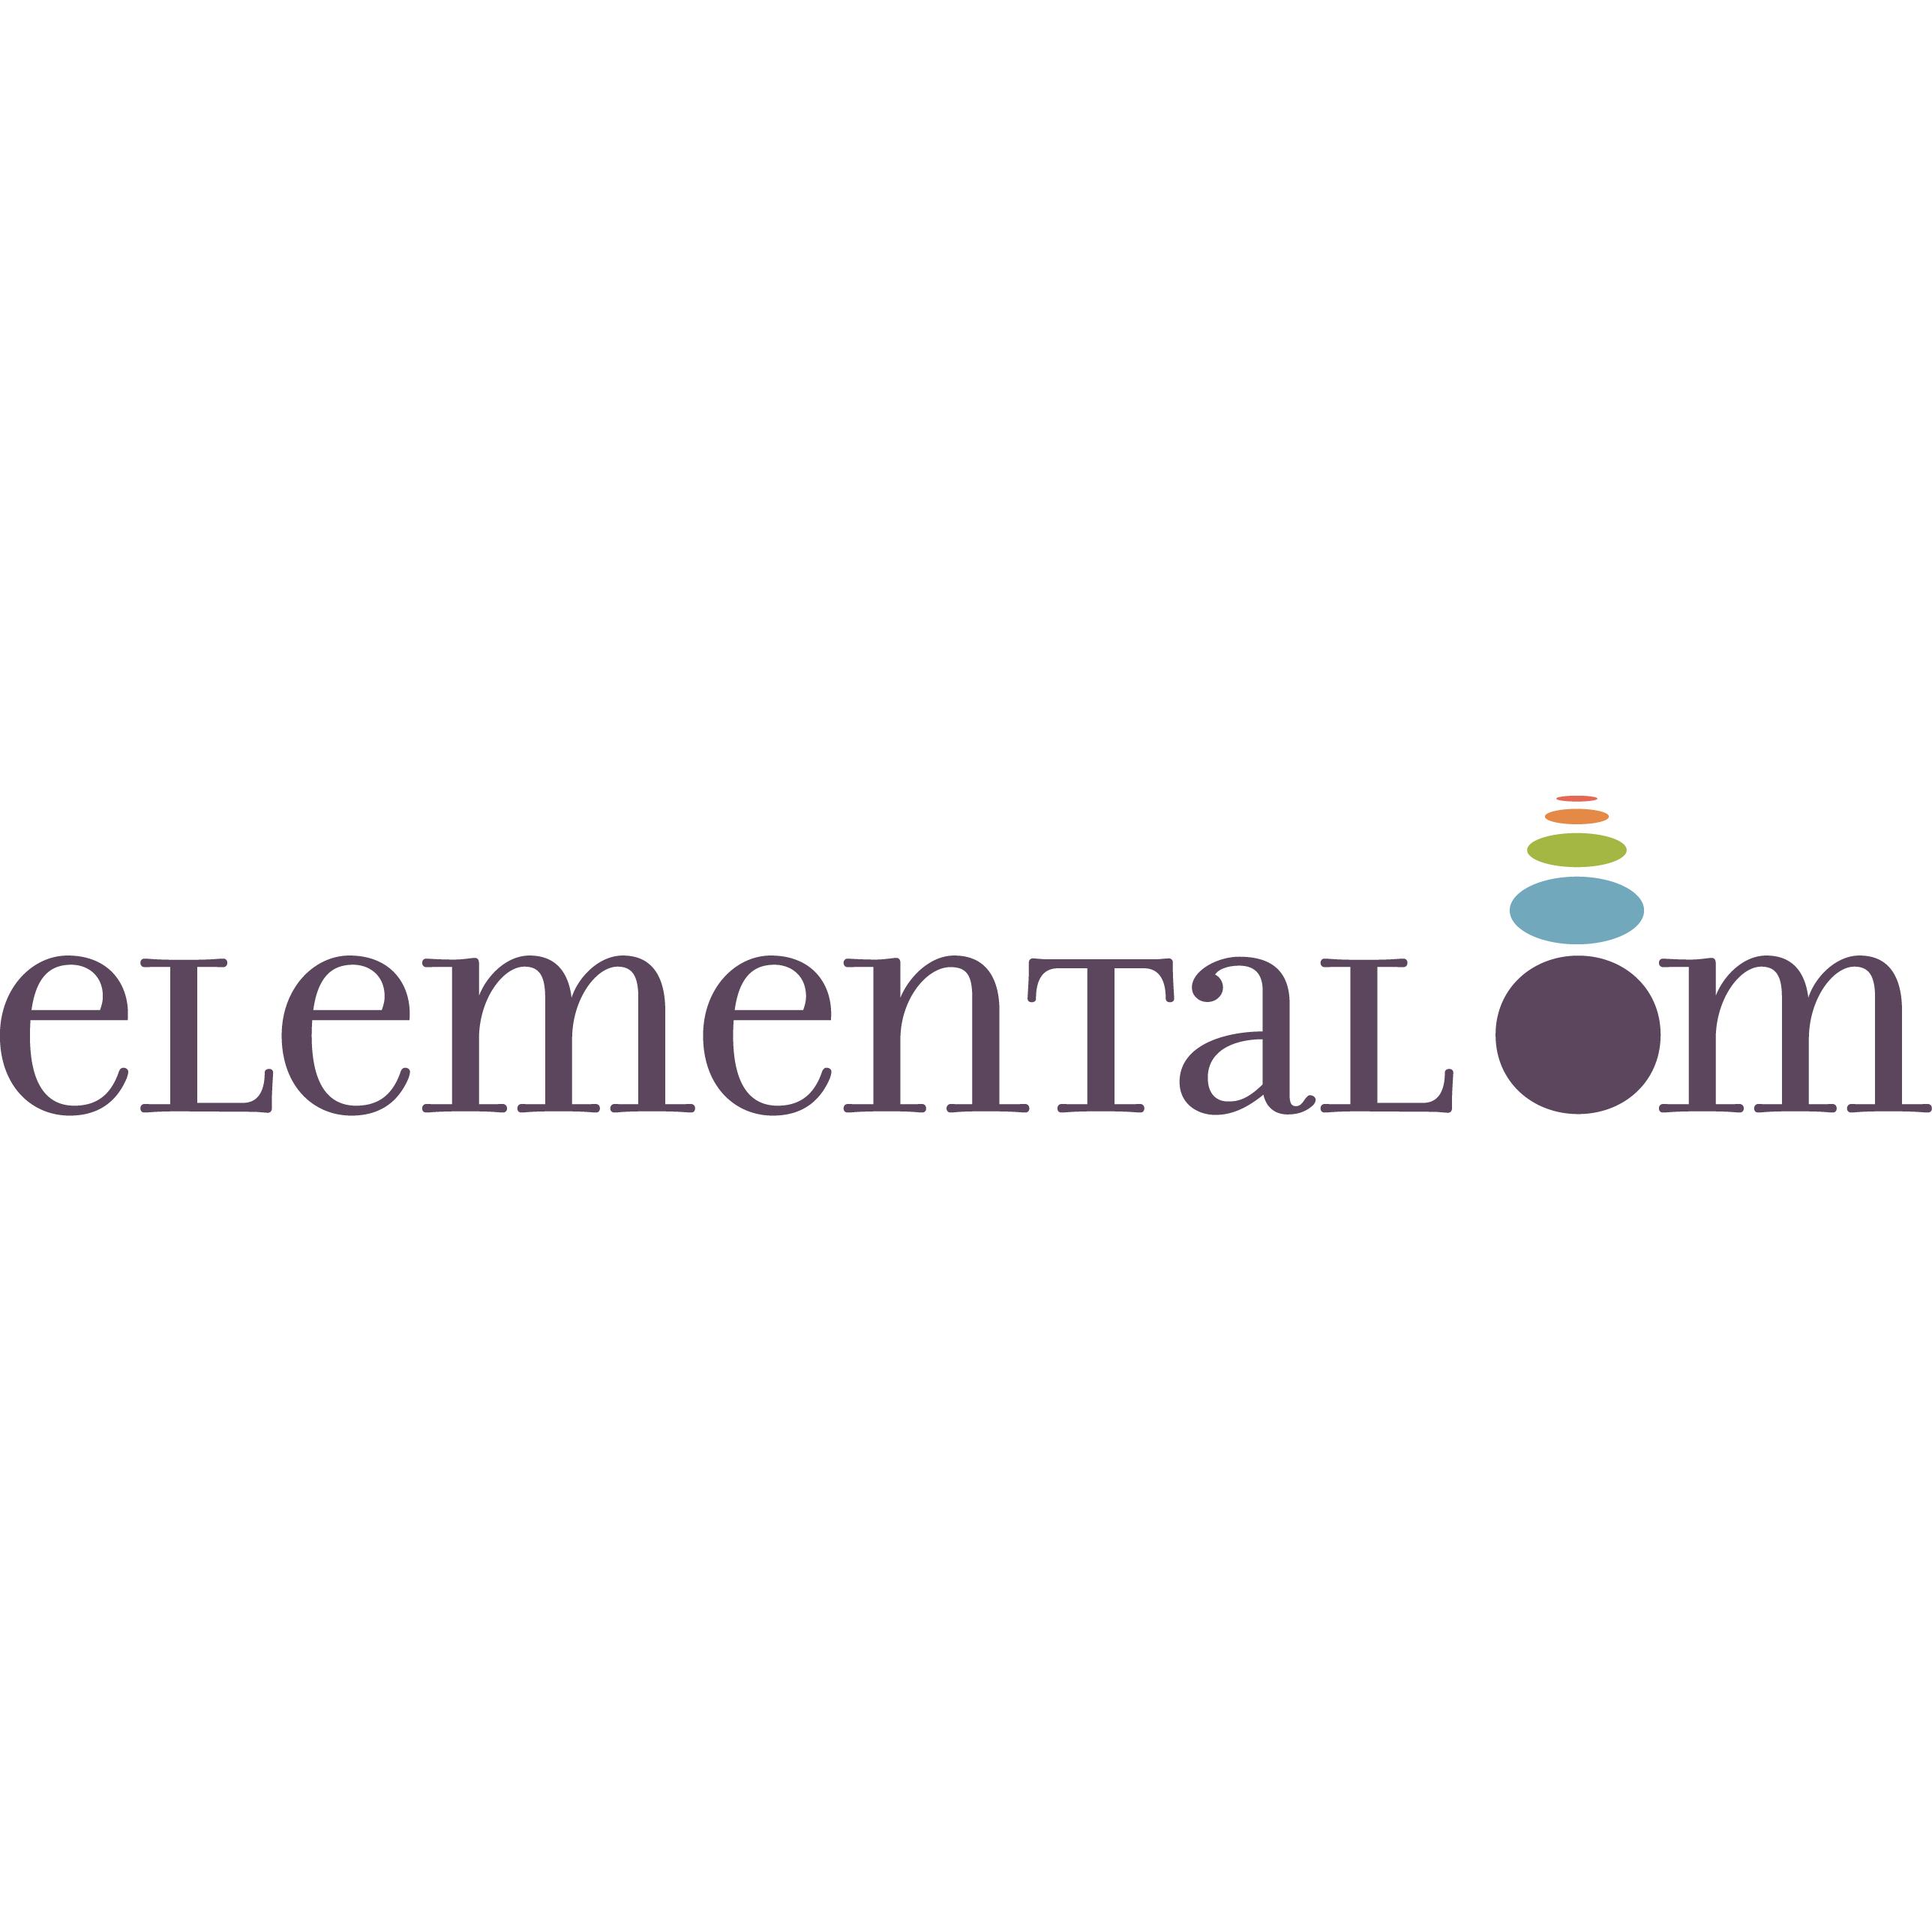 Elemental OM Yoga & Meditation Studio